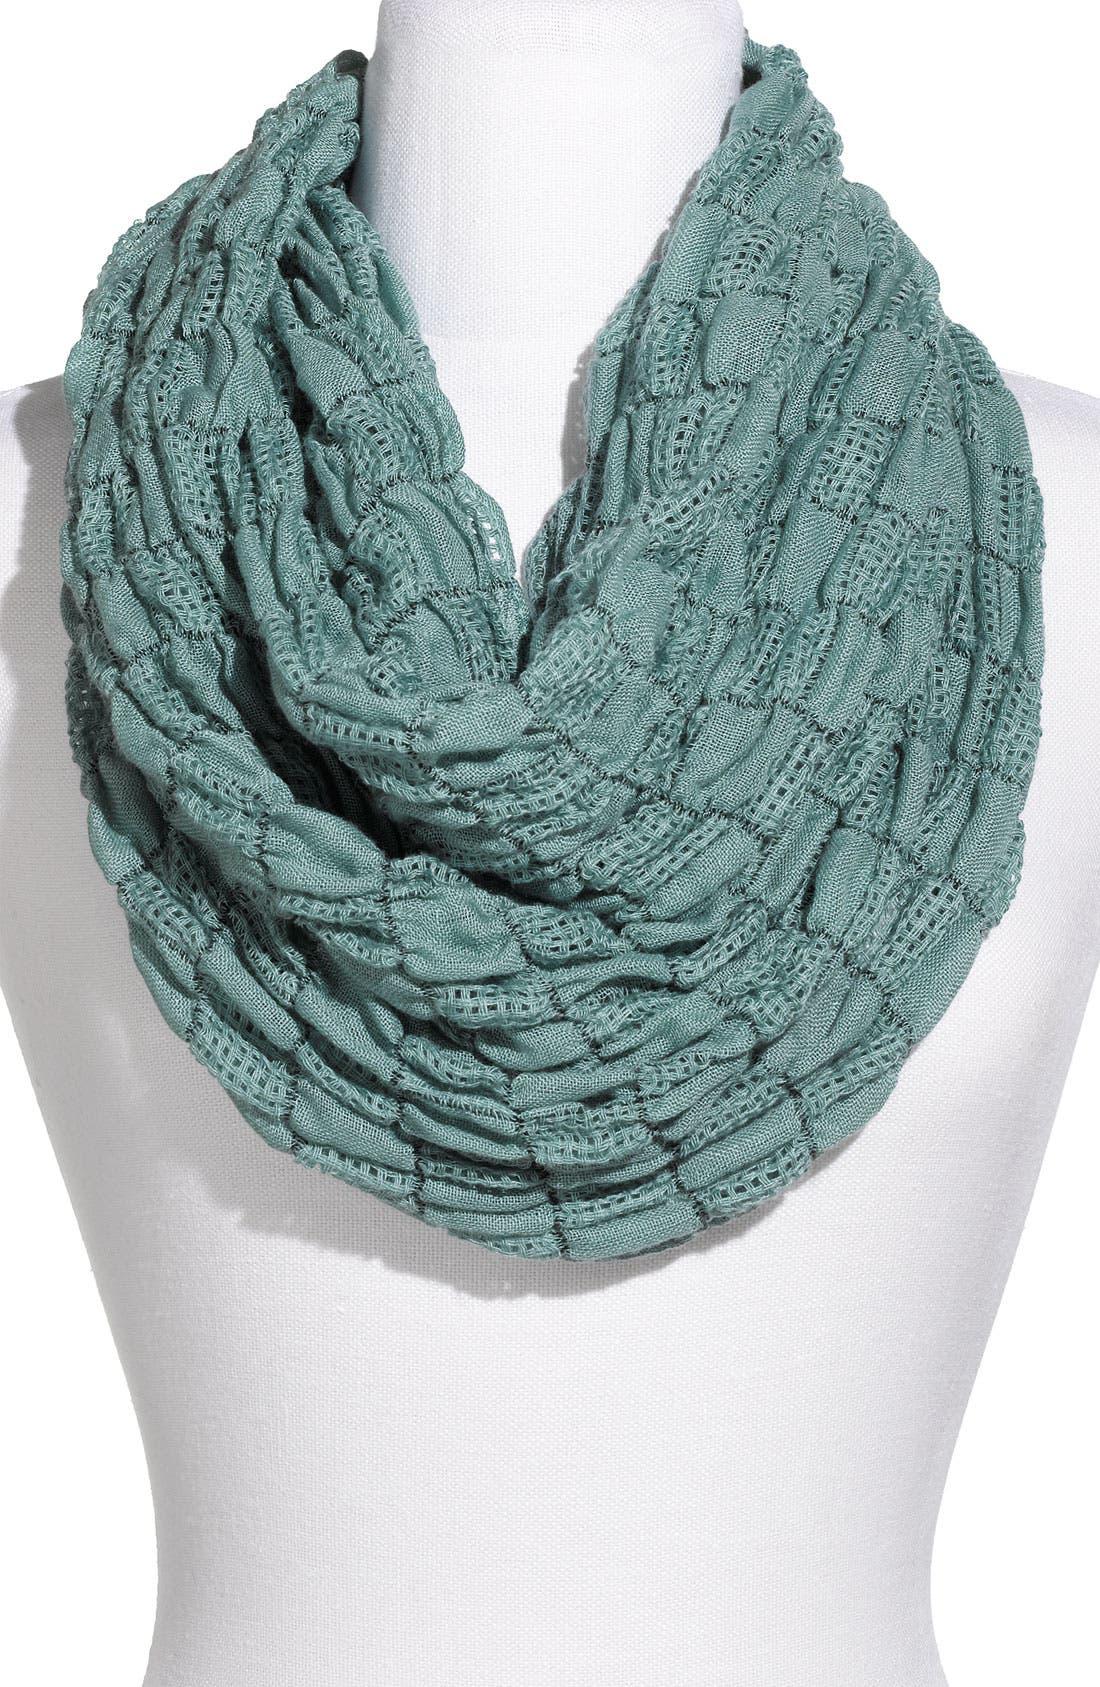 Main Image - Rubbish® Textured Check Infinity Scarf